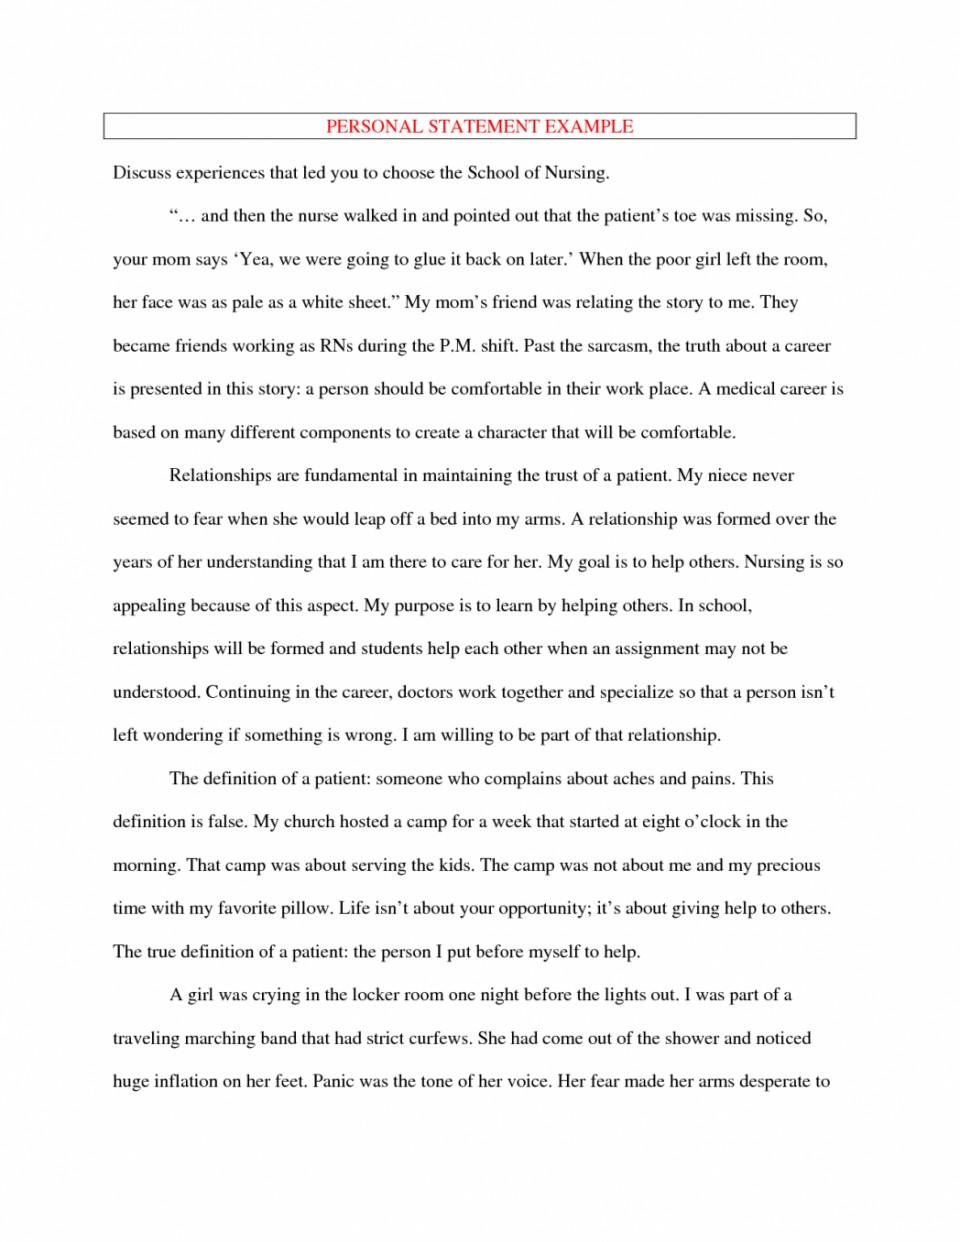 Argument essay questions